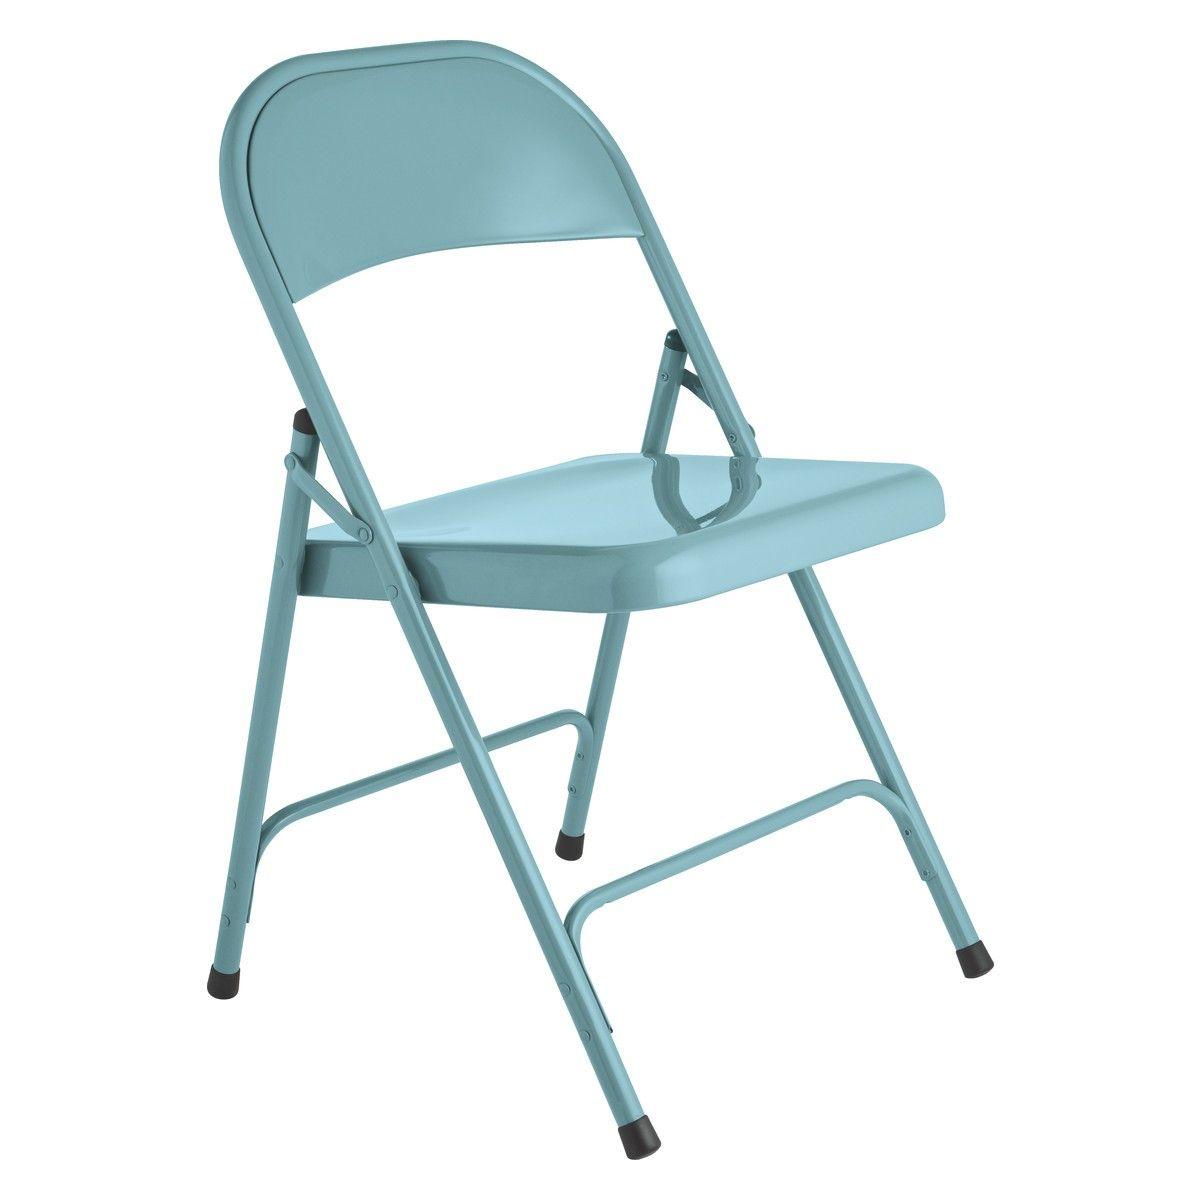 Macadam Blue Metal Folding Chair Metal Folding Chairs